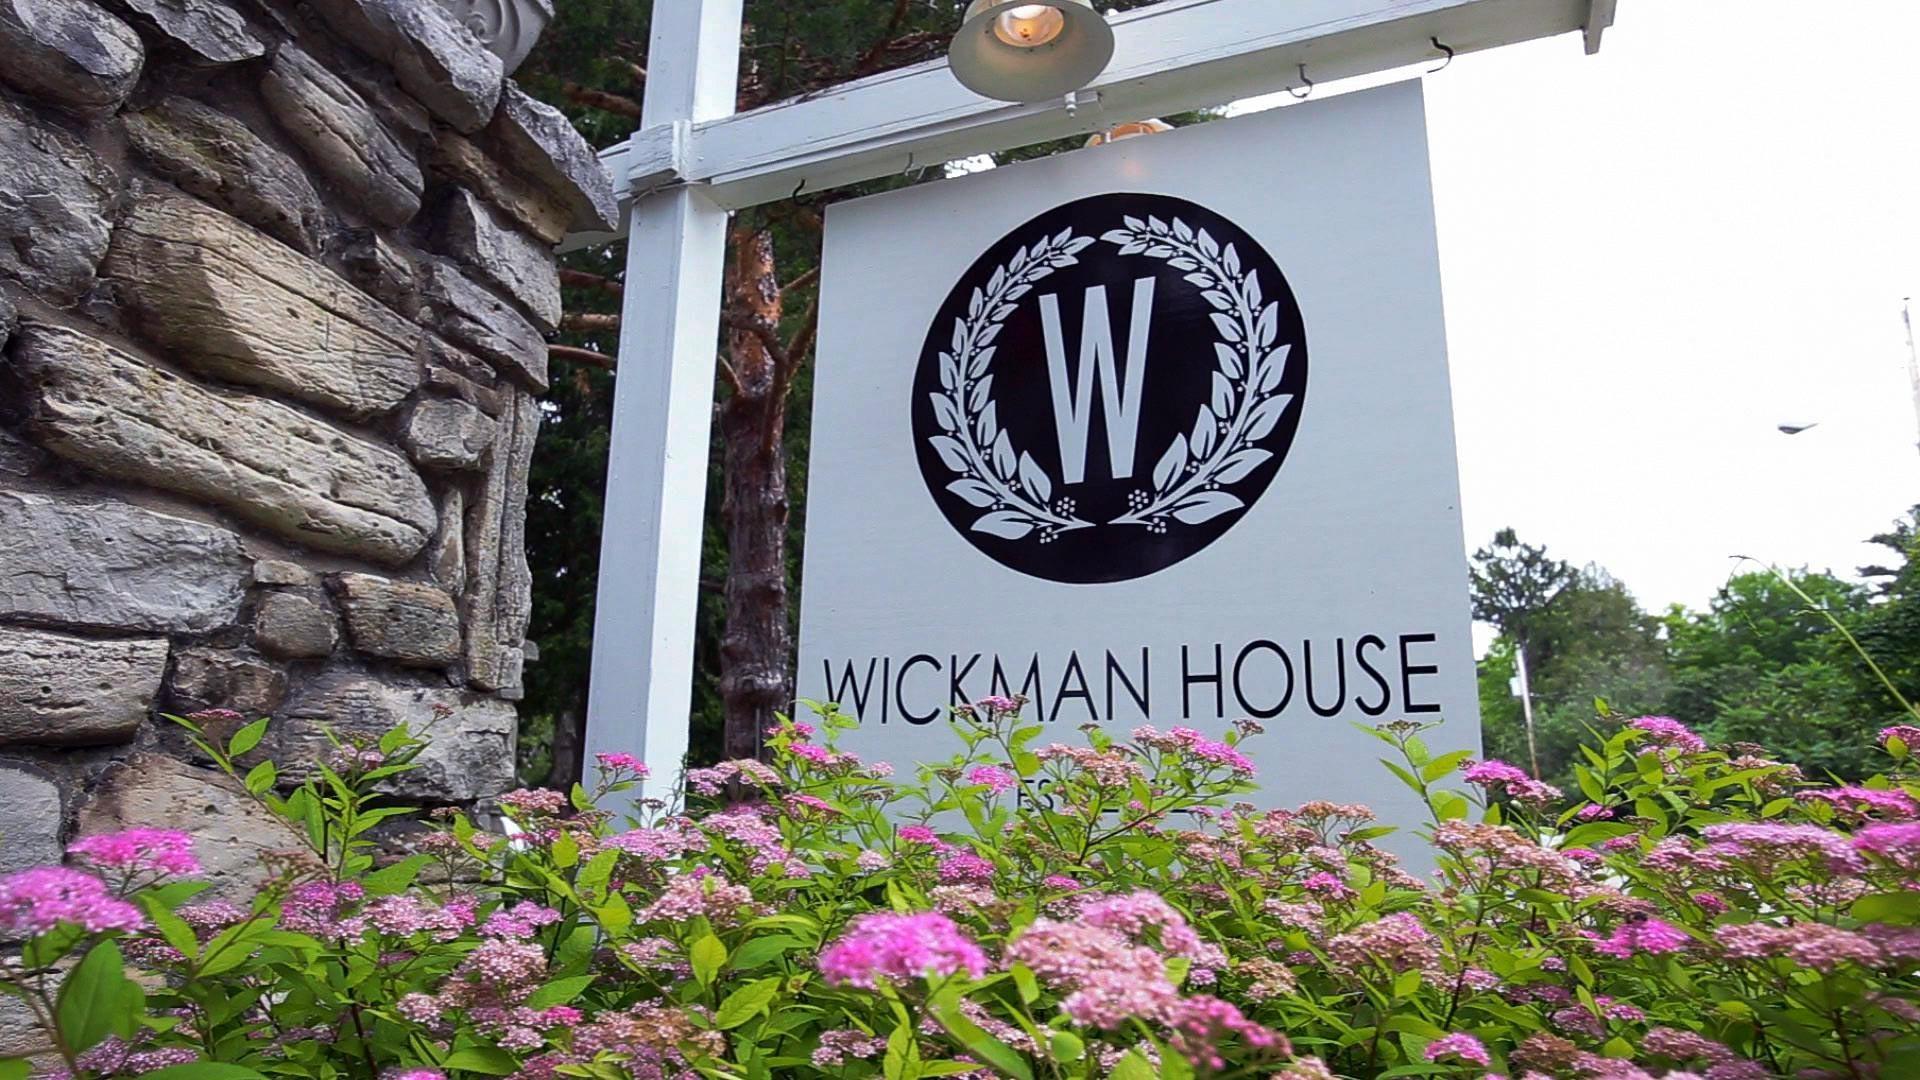 Waseda Farms Wickman House Season 5 Episode 1 Wisconsin Foodie